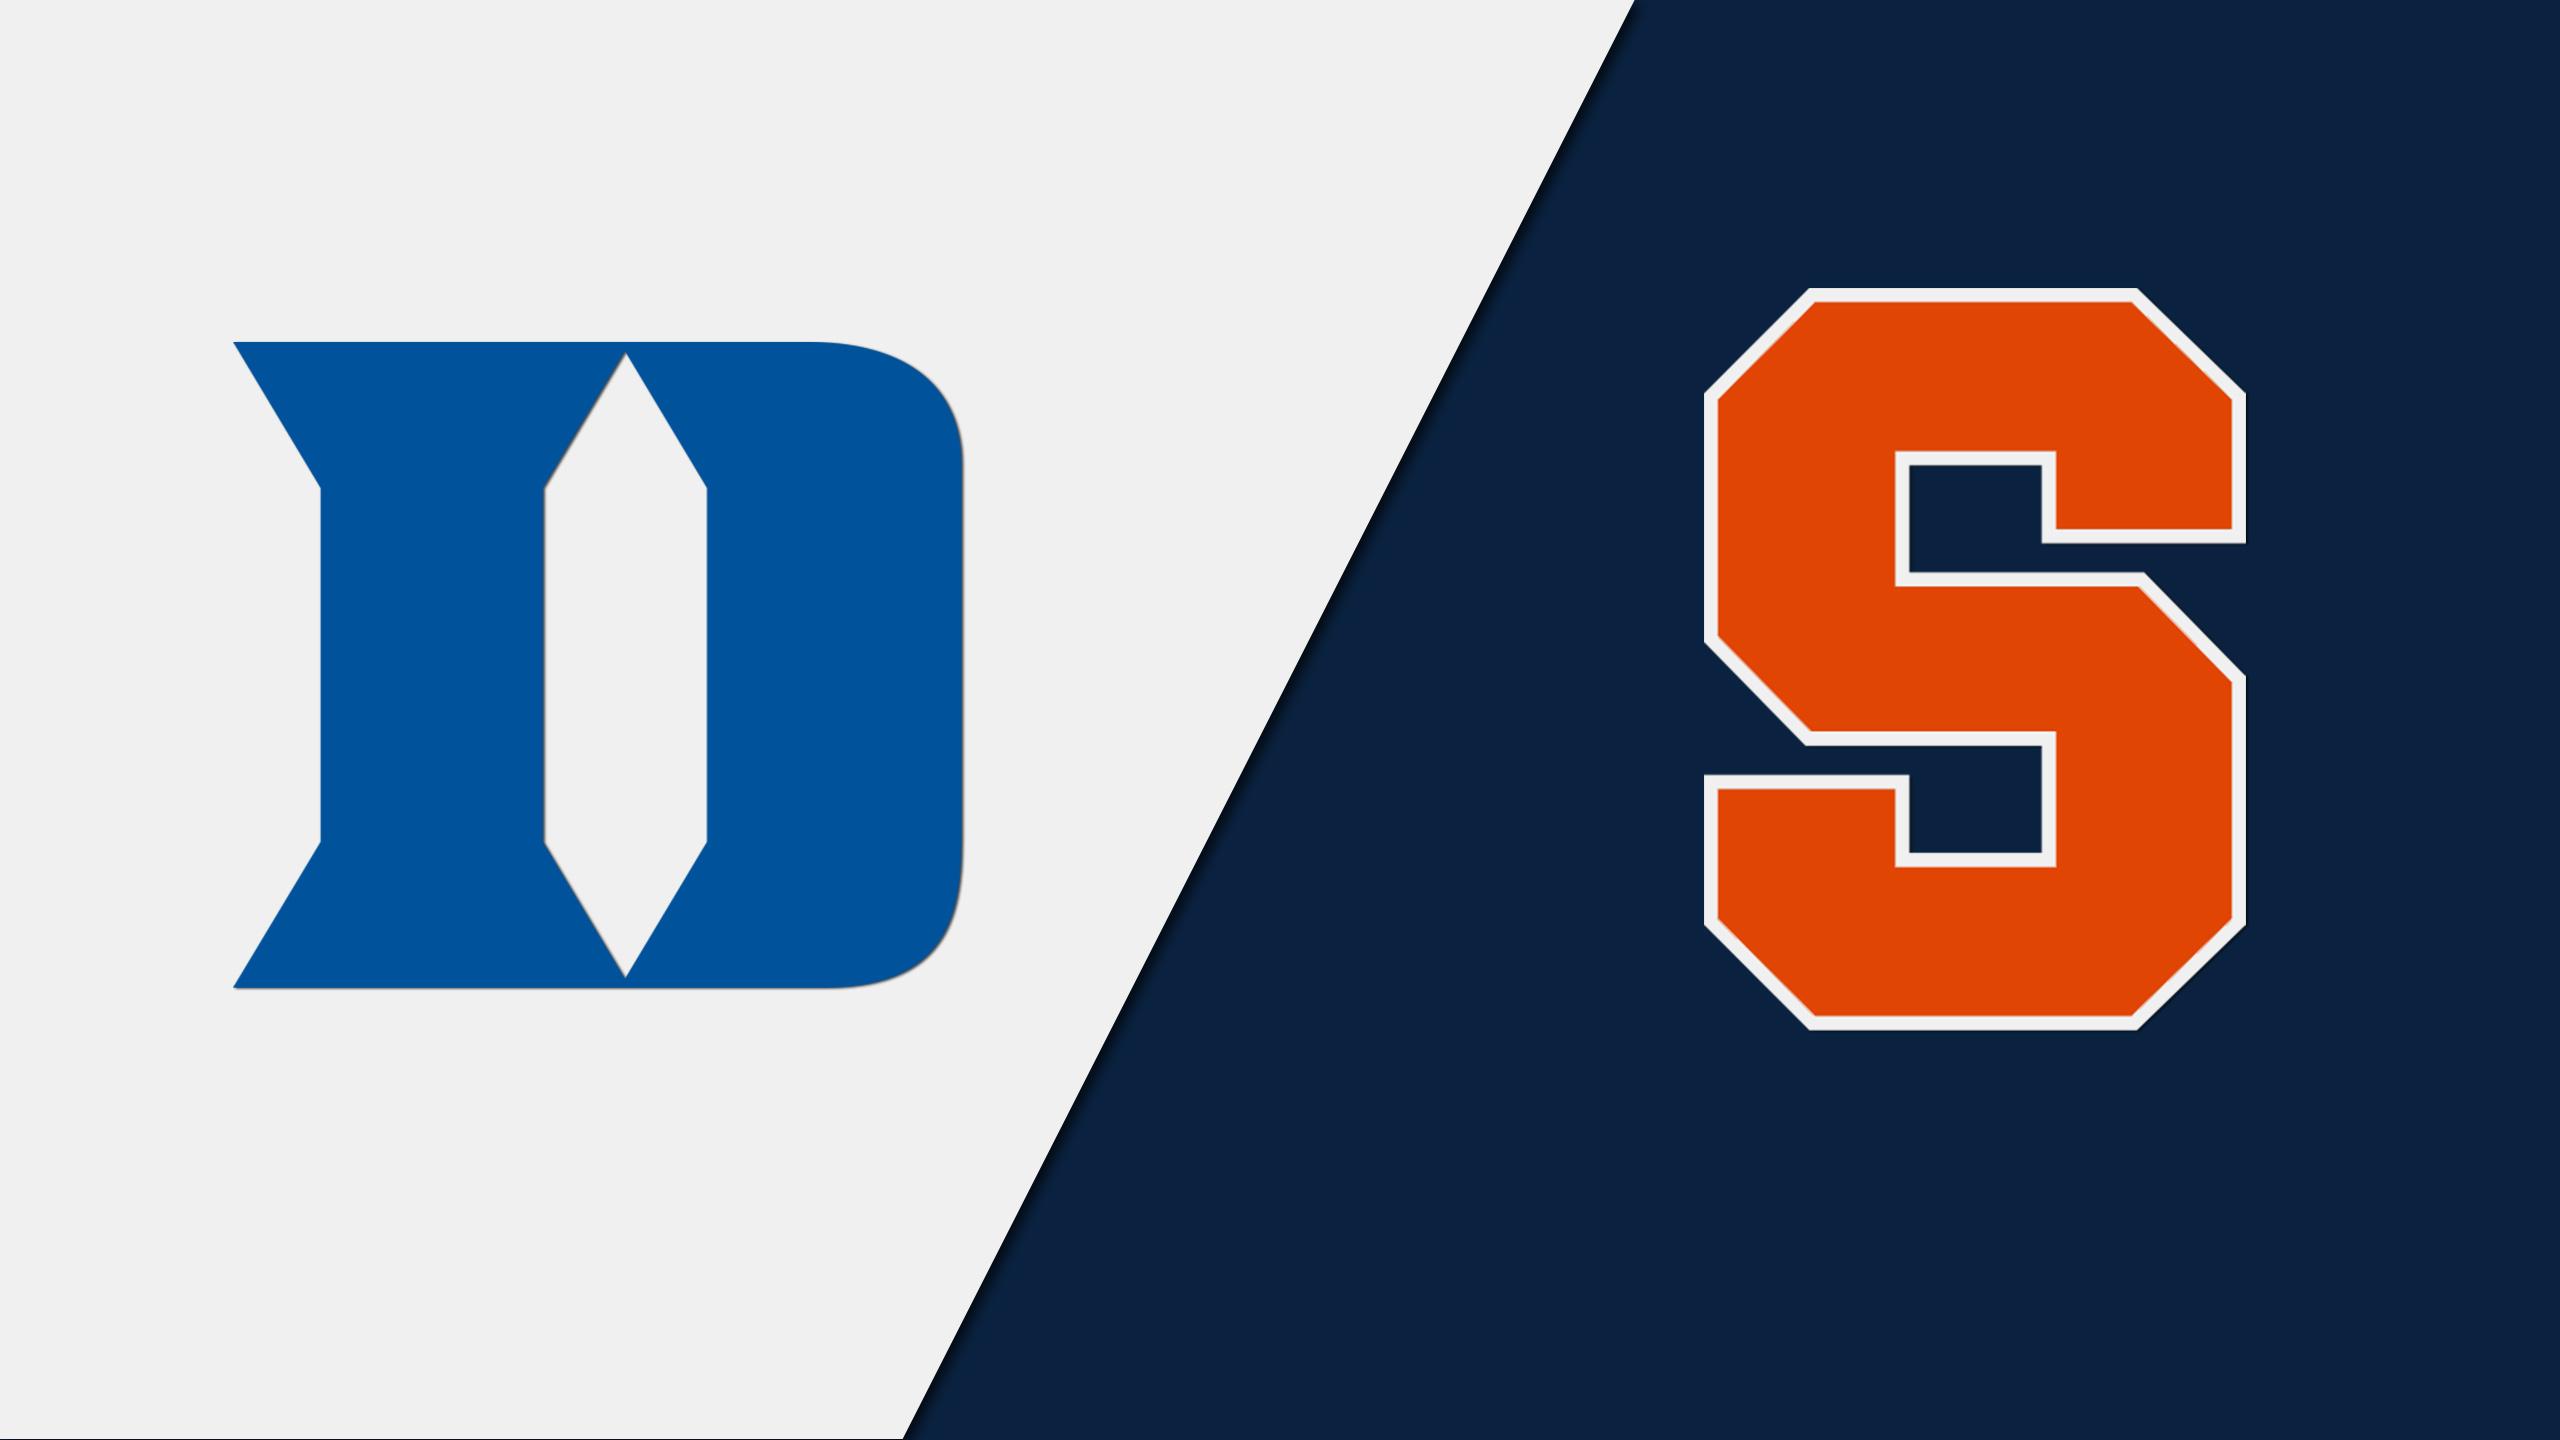 #2 Duke vs. #12 Syracuse (M Lacrosse)